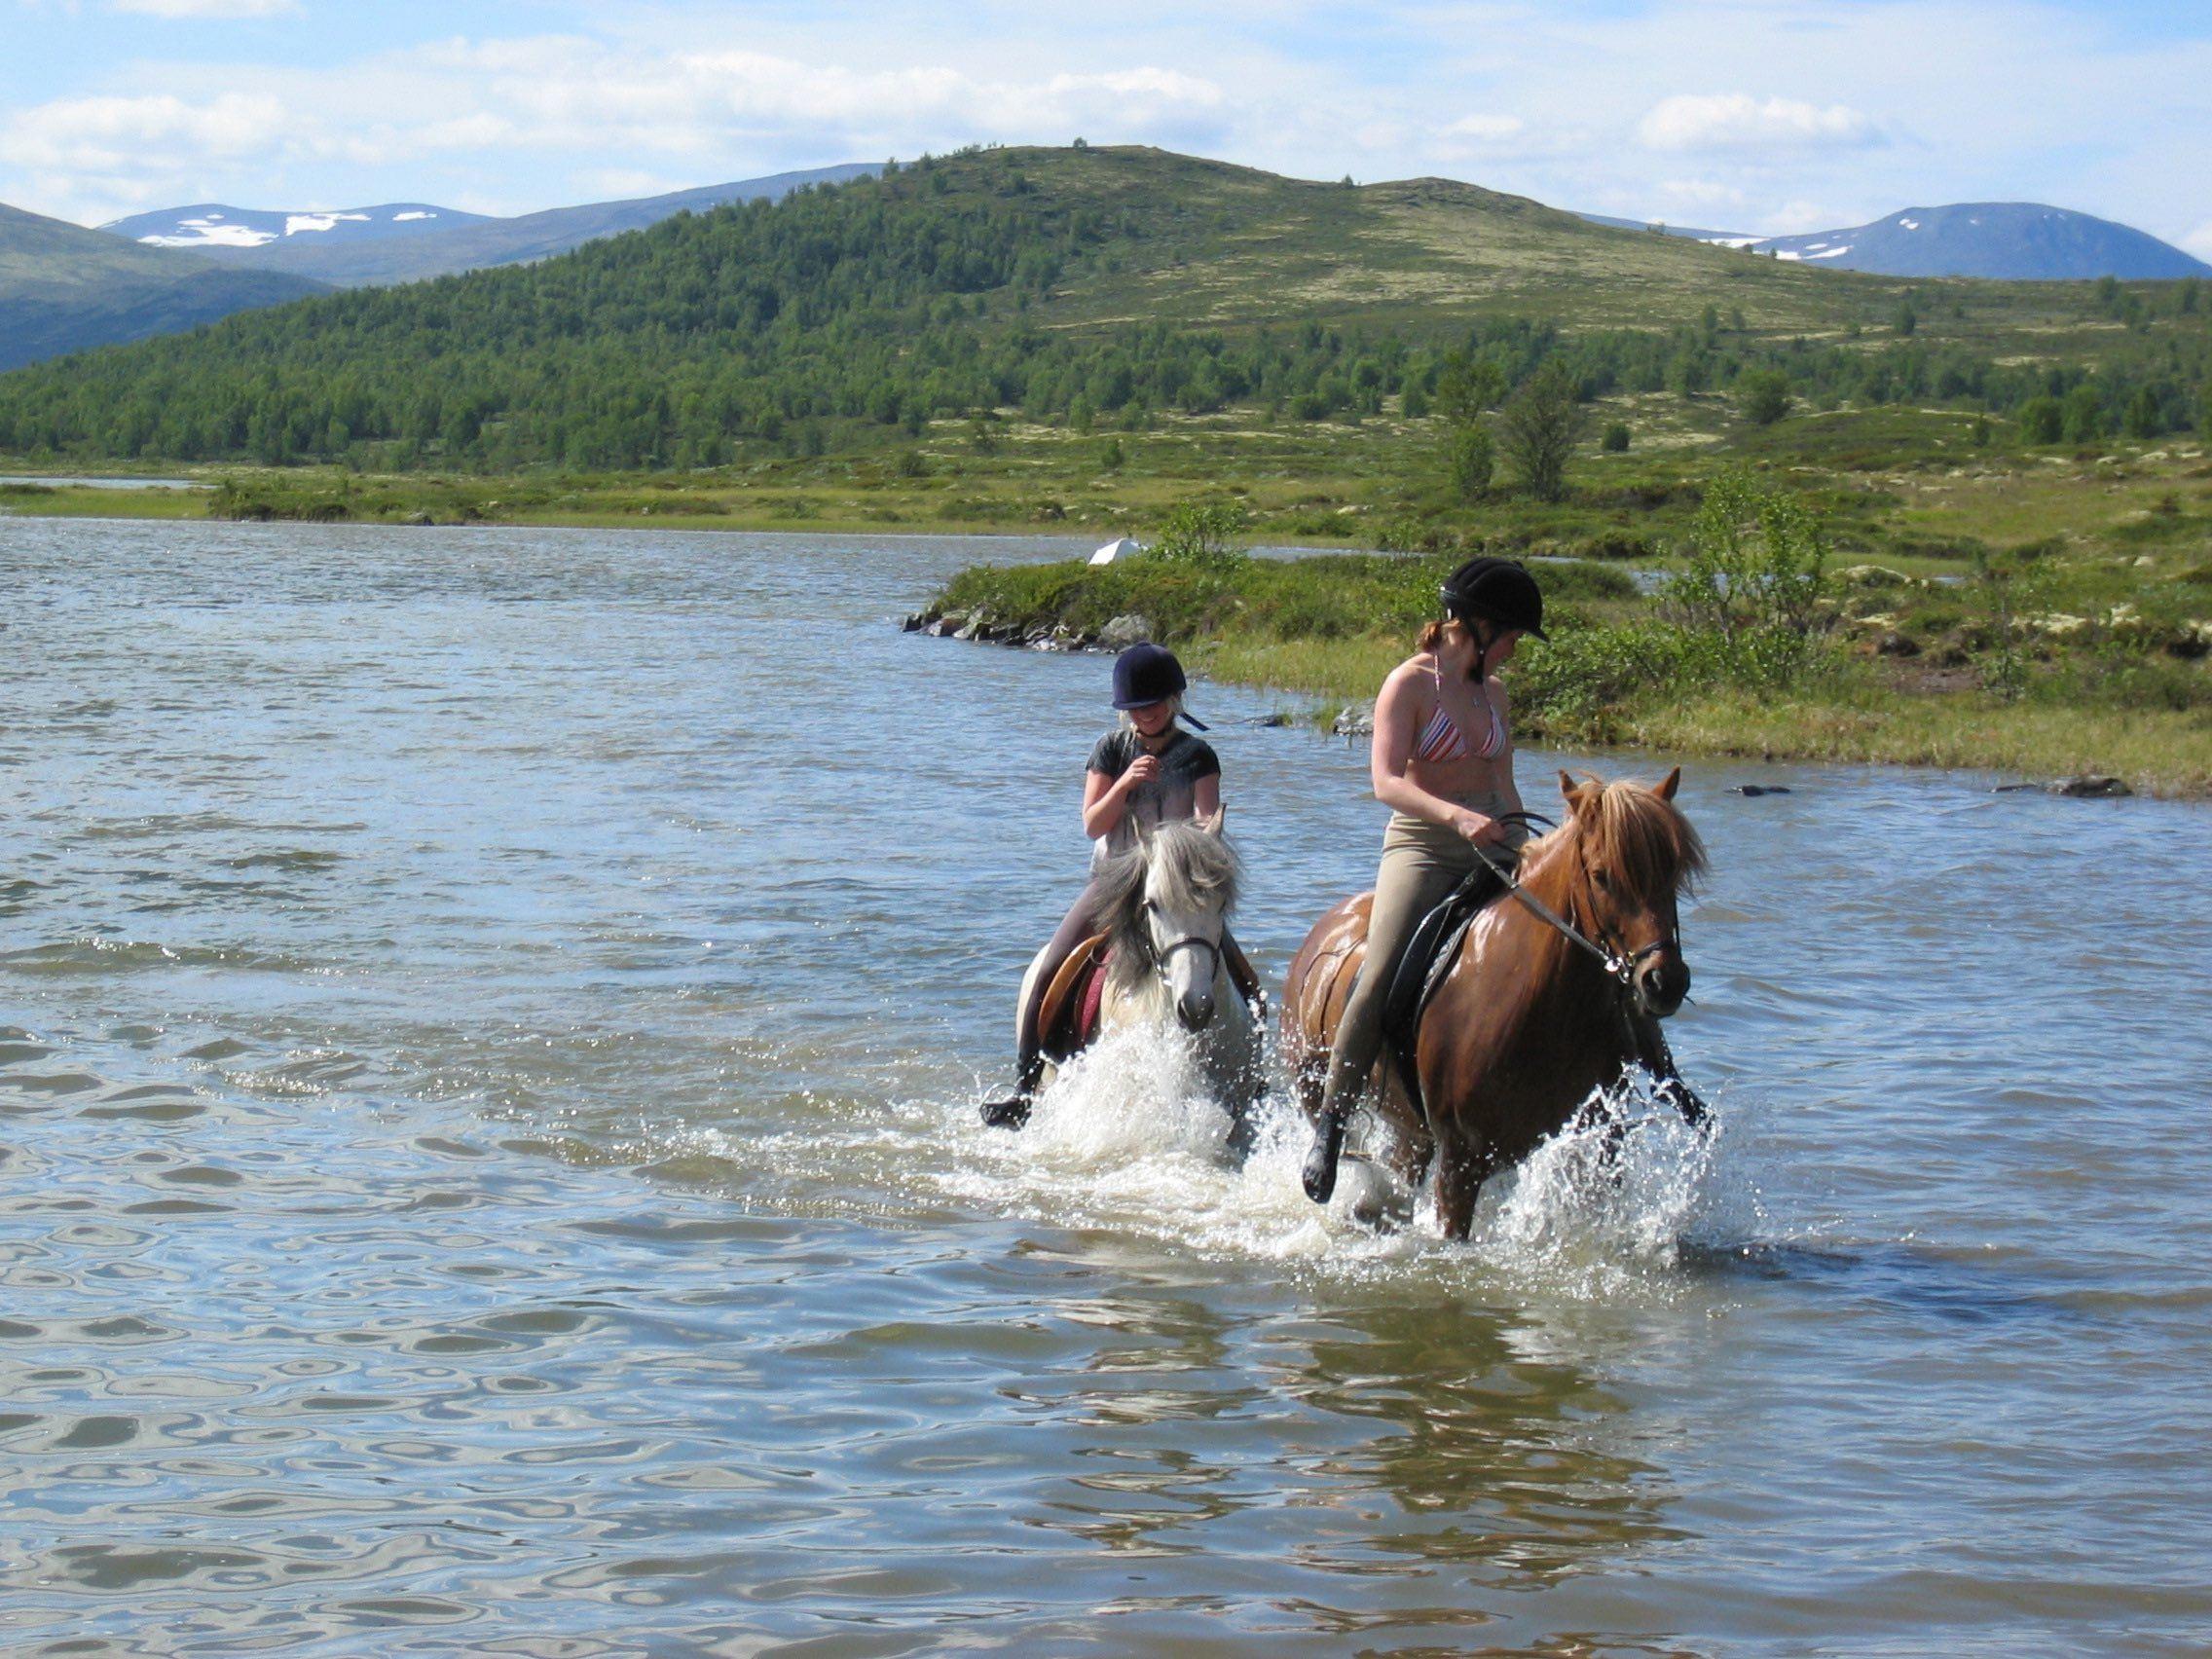 Horseback riding at the Dovrefjell plateau